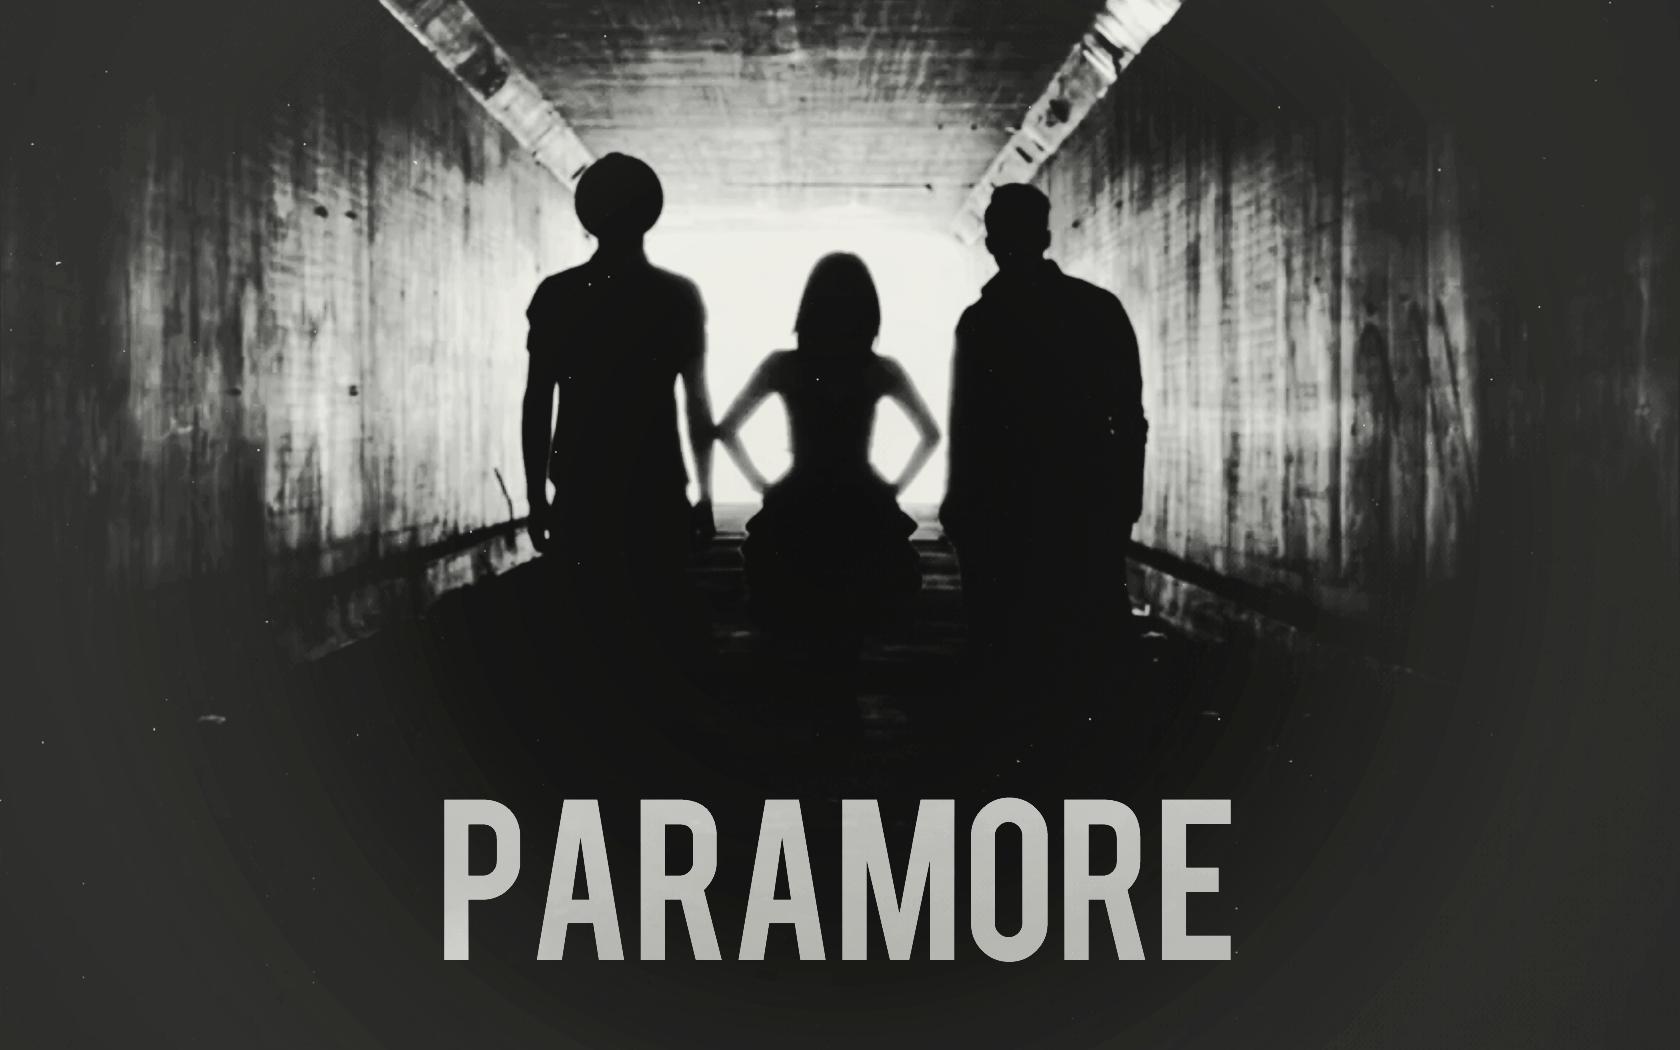 paramore 2017 album cover - photo #20